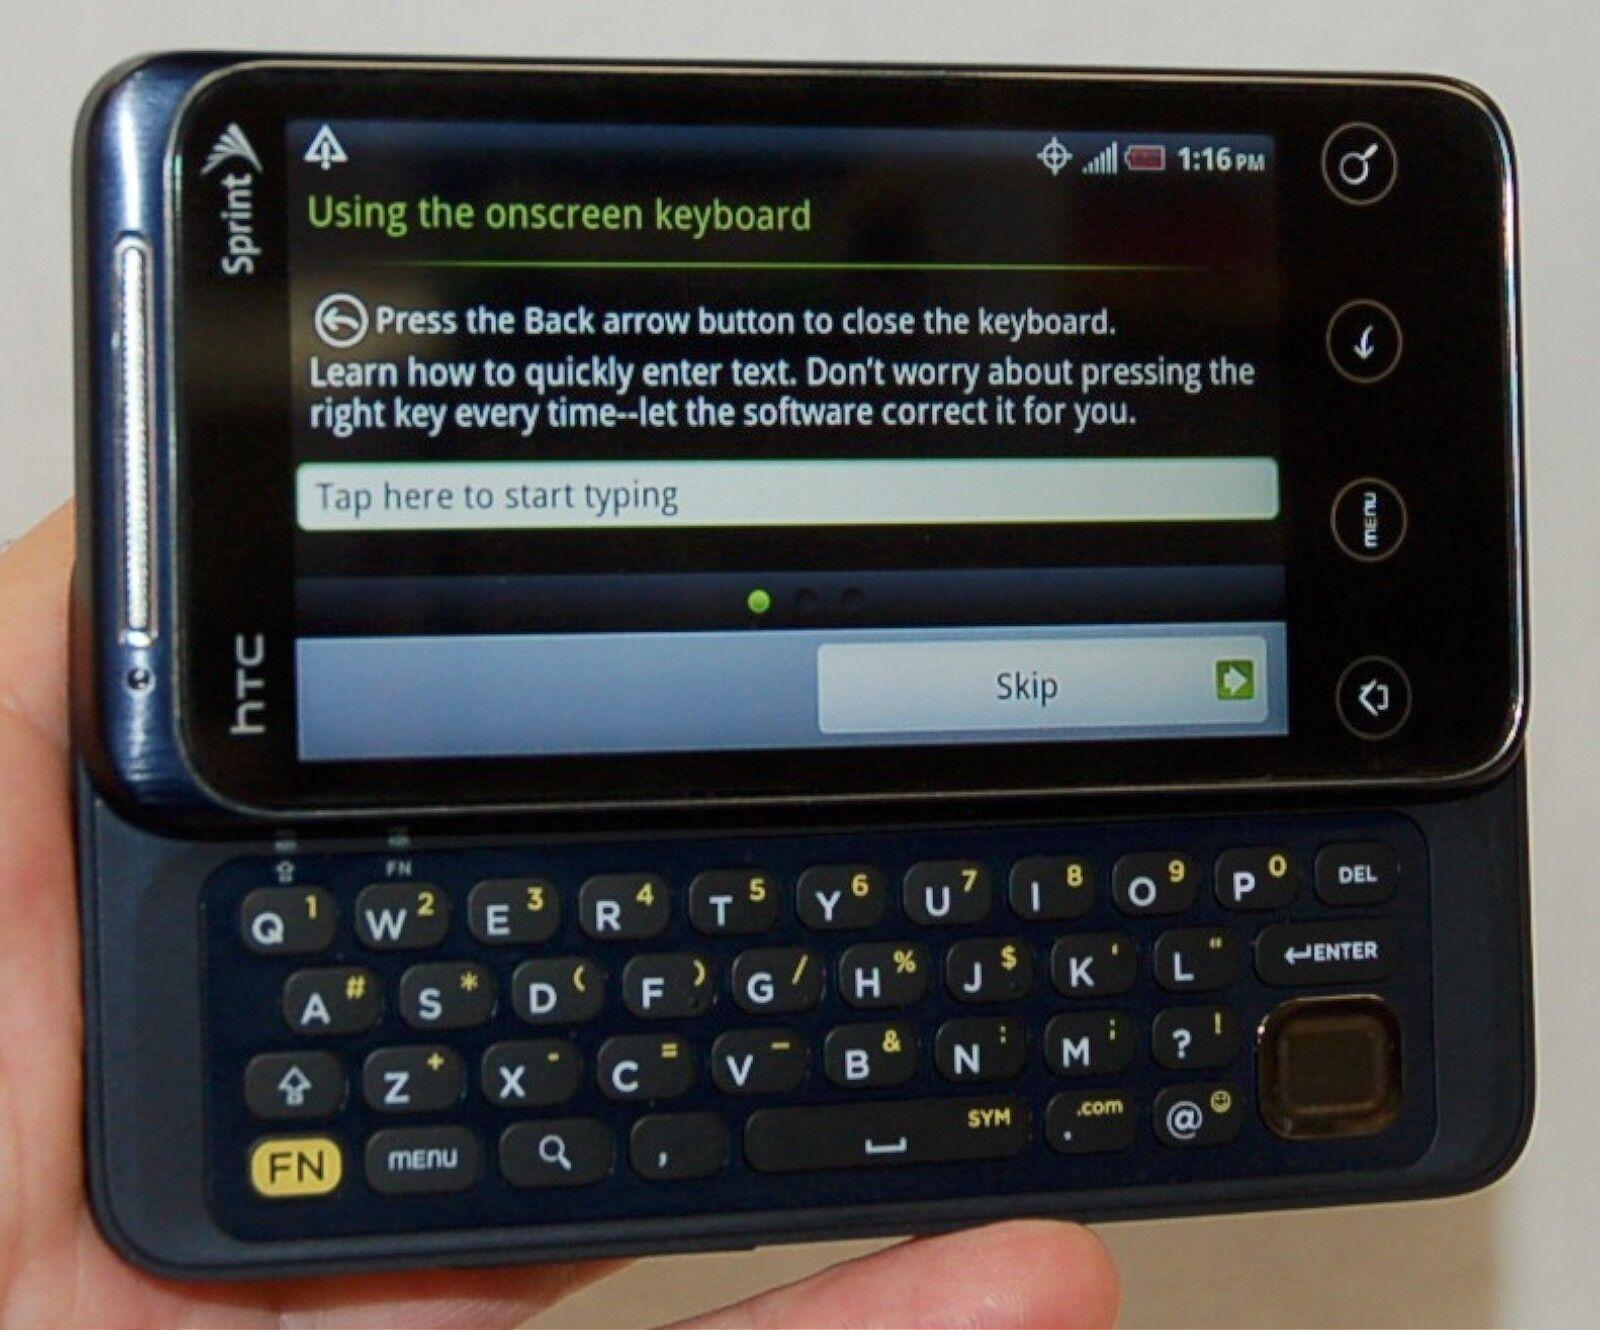 htc evo shift 4g droid sprint blue android cell phone pg06100 wifi rh ebay com Sprint HTC EVO 4G Cases HTC EVO 4G White